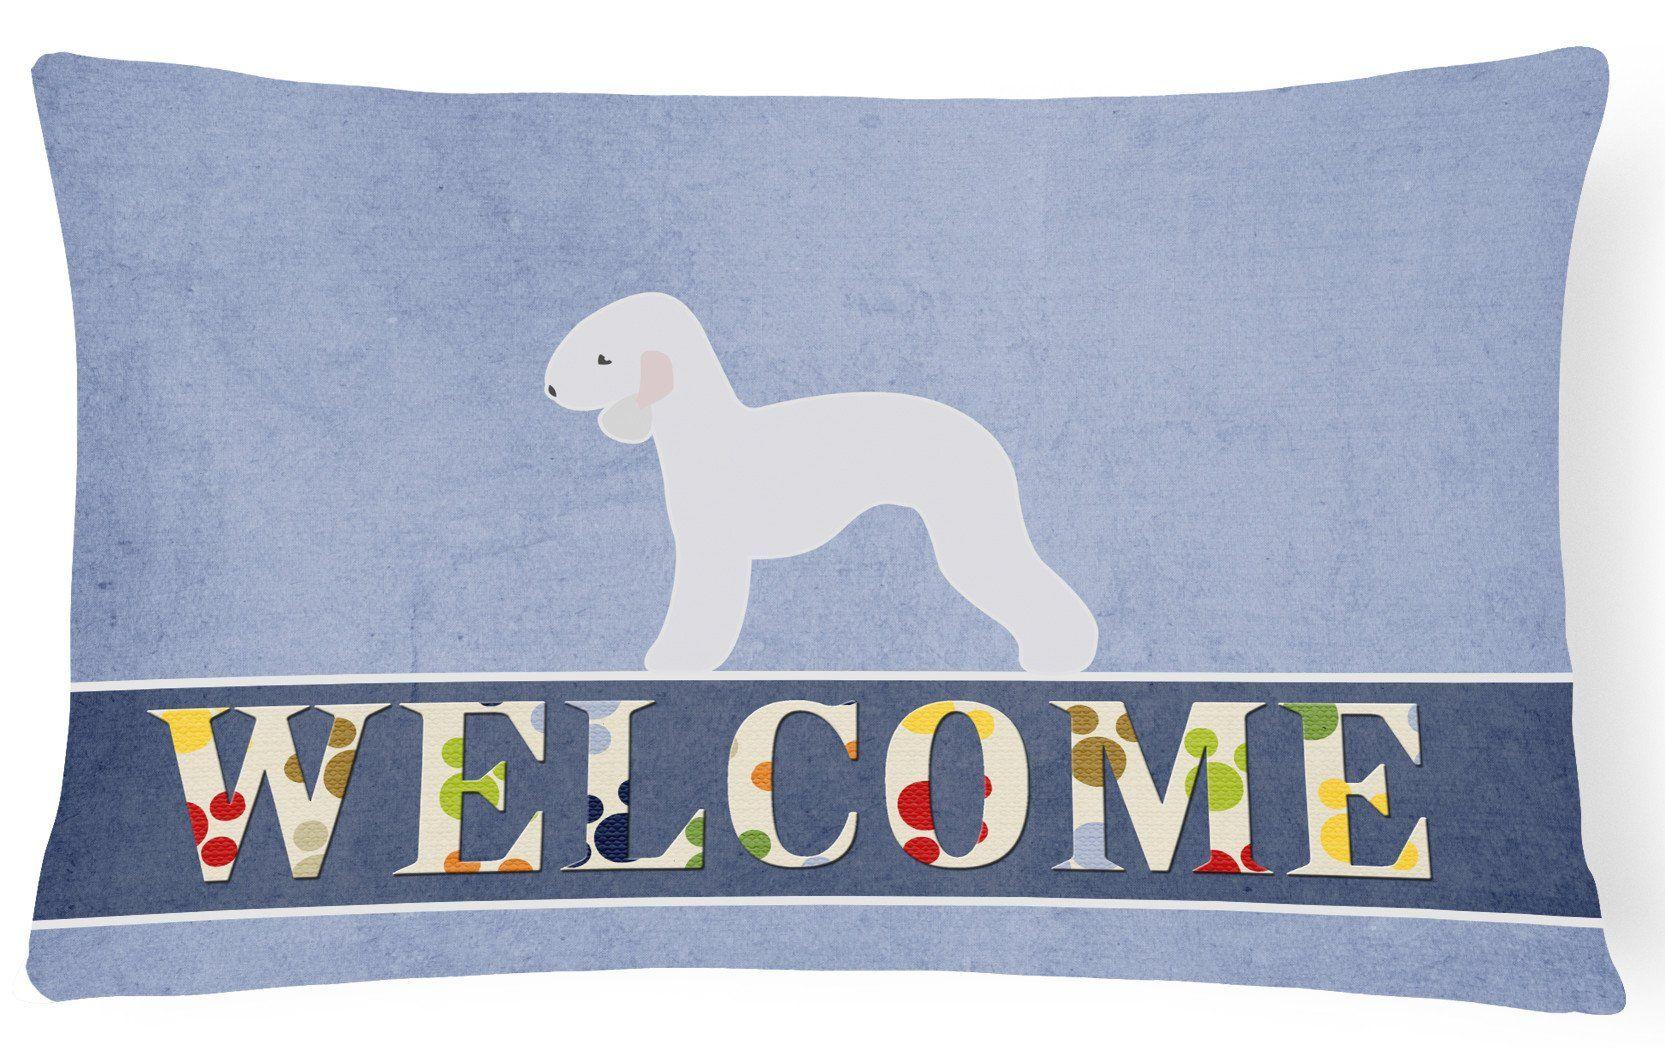 Bedlington Terrier Welcome Canvas Fabric Decorative Pillow BB5498PW1216